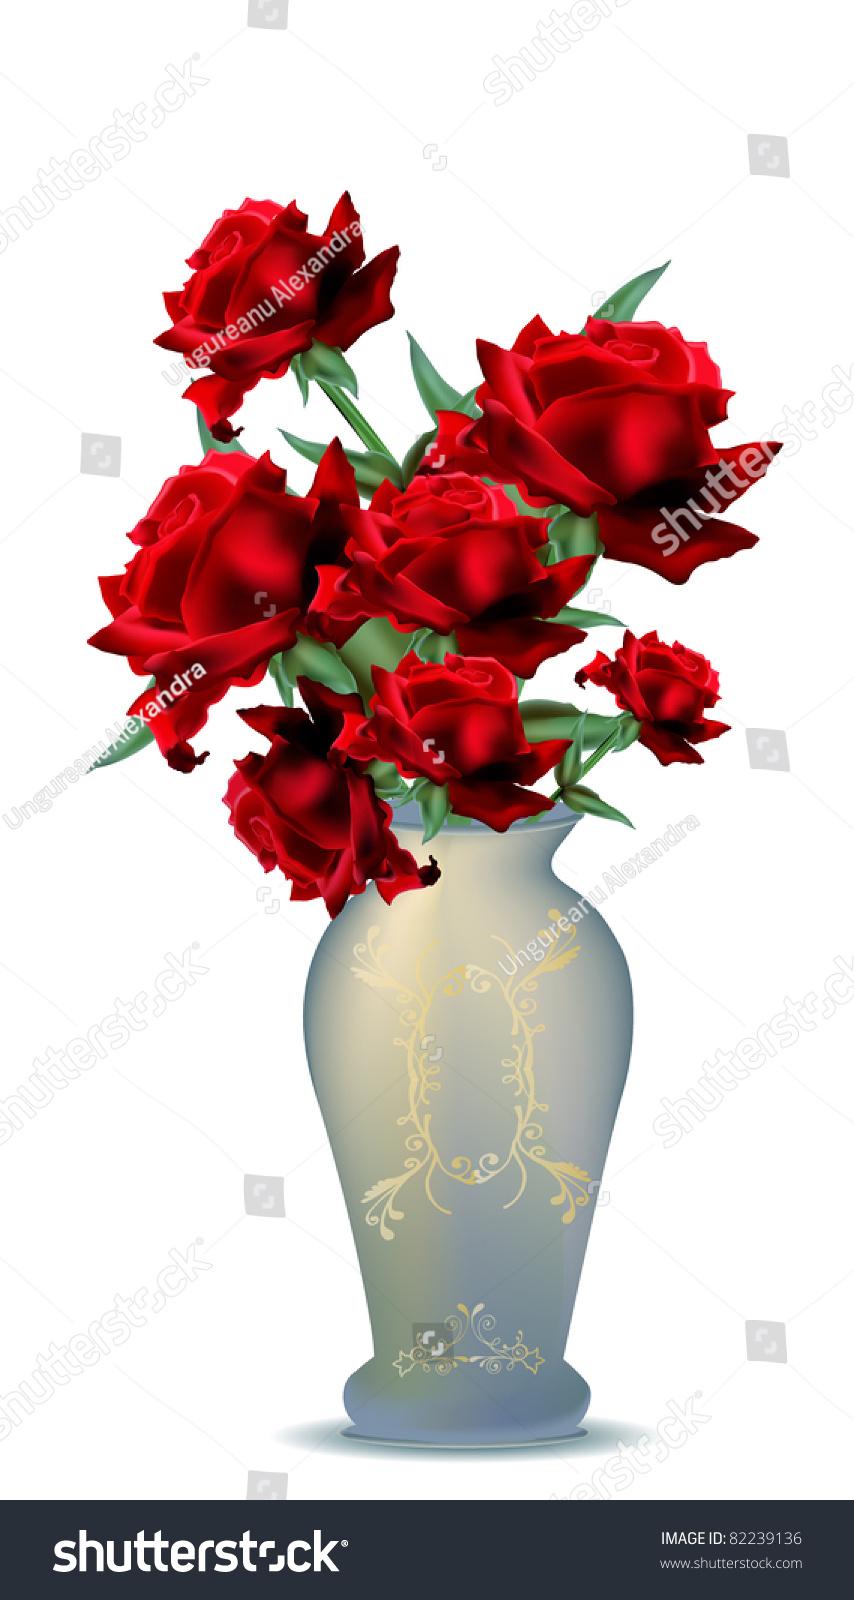 Beautiful flower vase filled red roses stock vector royalty free beautiful flower vase filled with red roses vector illustration izmirmasajfo